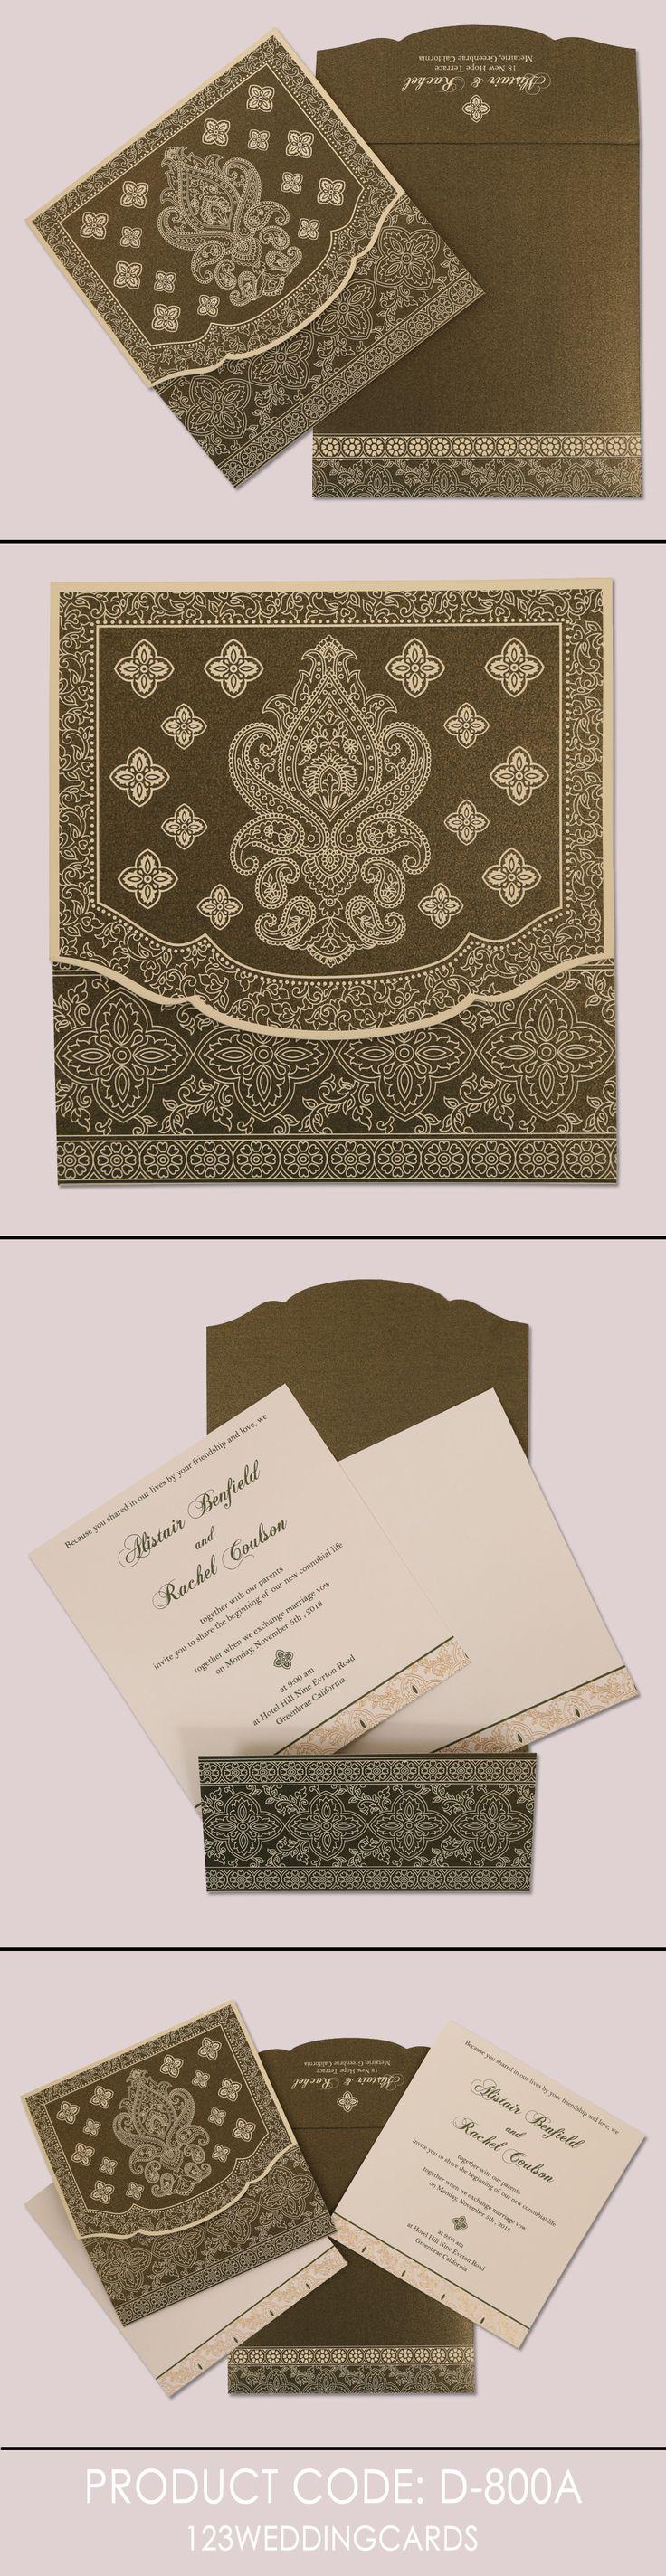 matter for wedding invitation in gujarati%0A Green shimmery screen printed wedding invitation   so   a